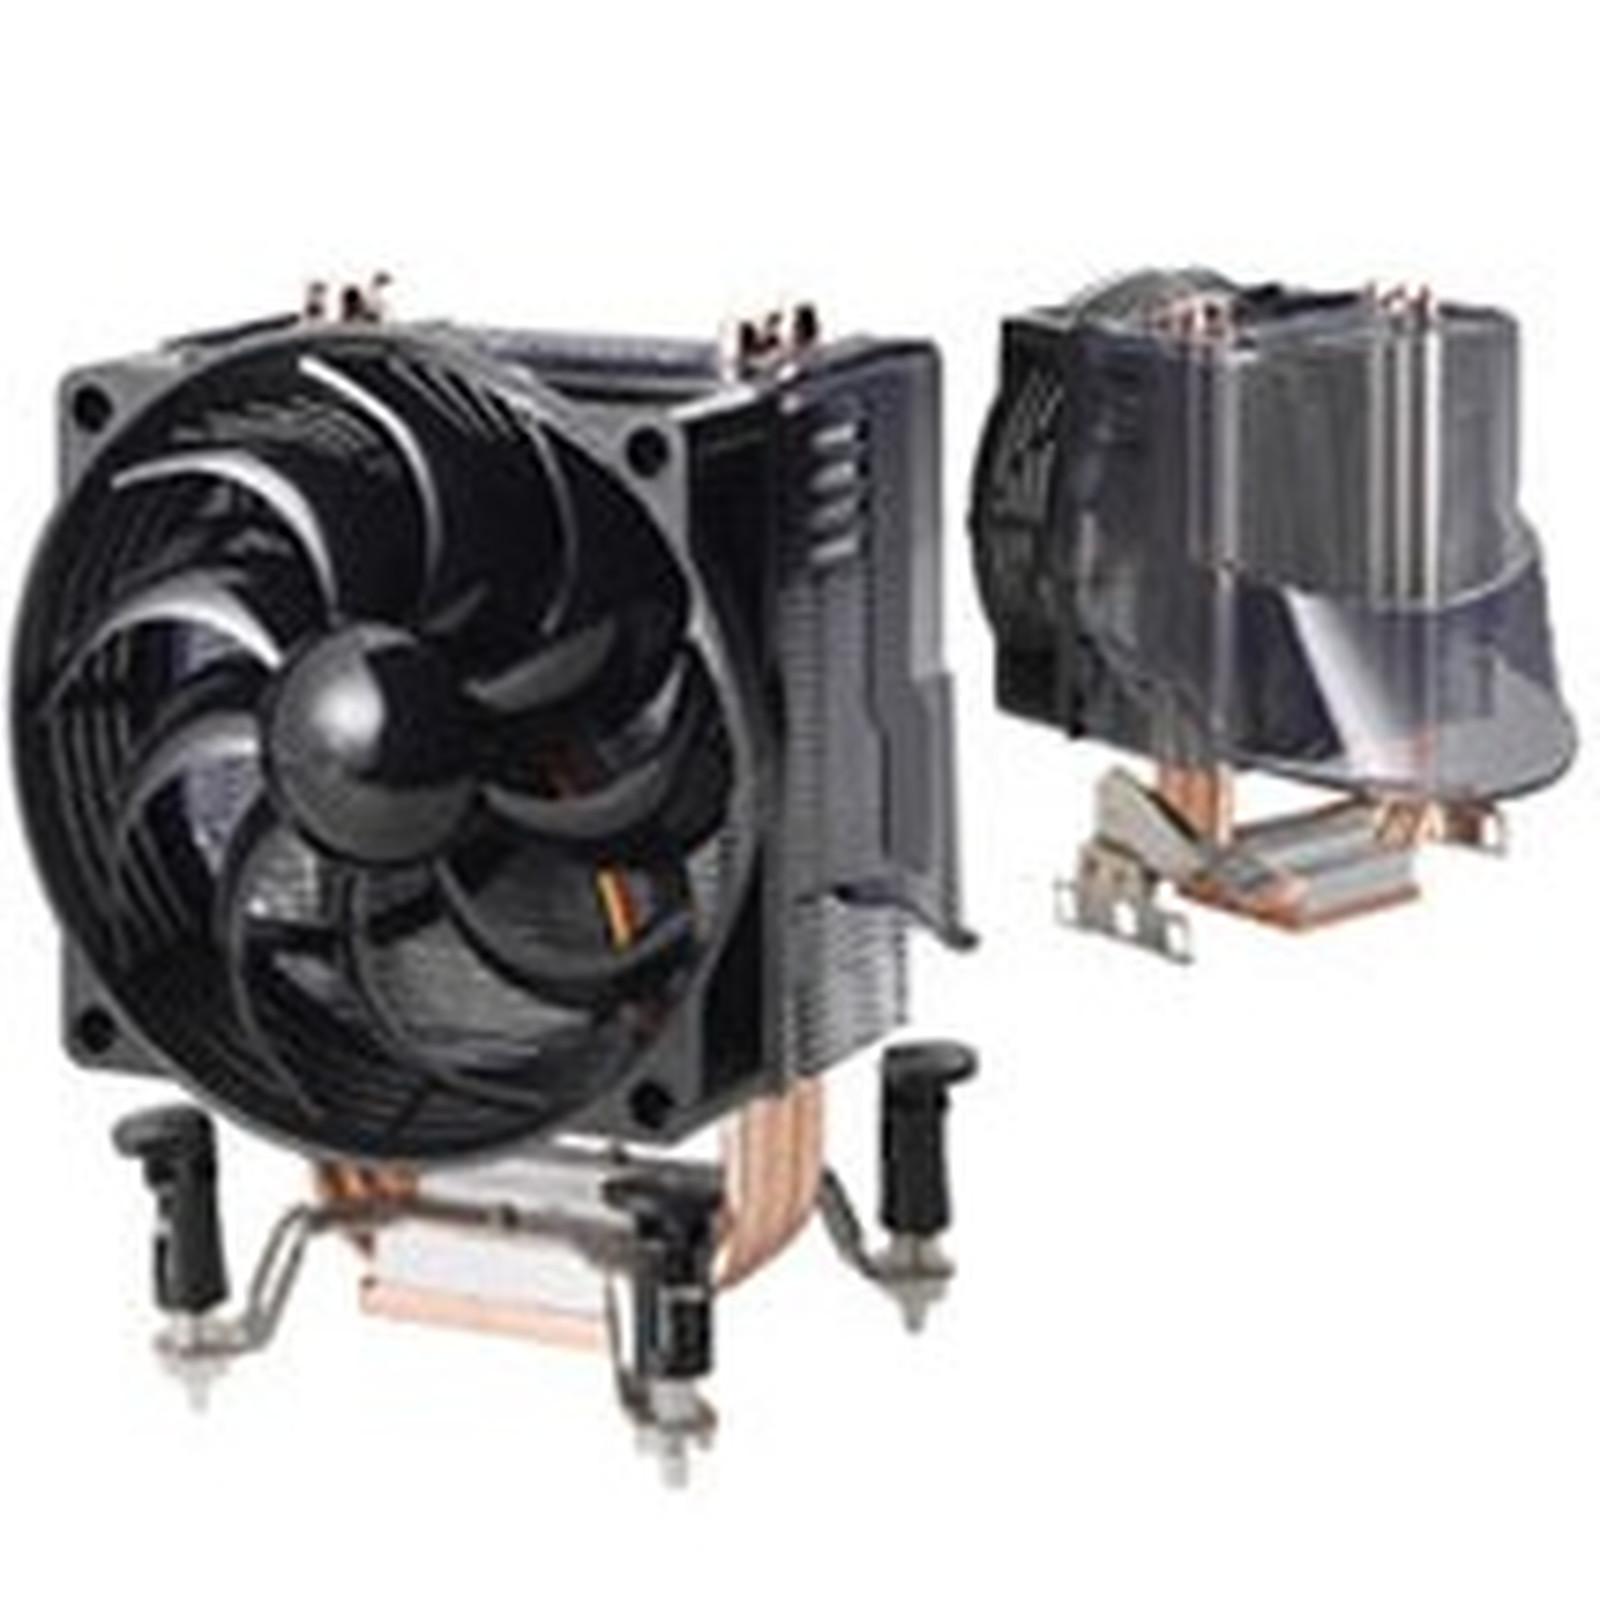 Cooler Master Hyper TX 2 - Ventilateur processeur Cooler Master Ltd